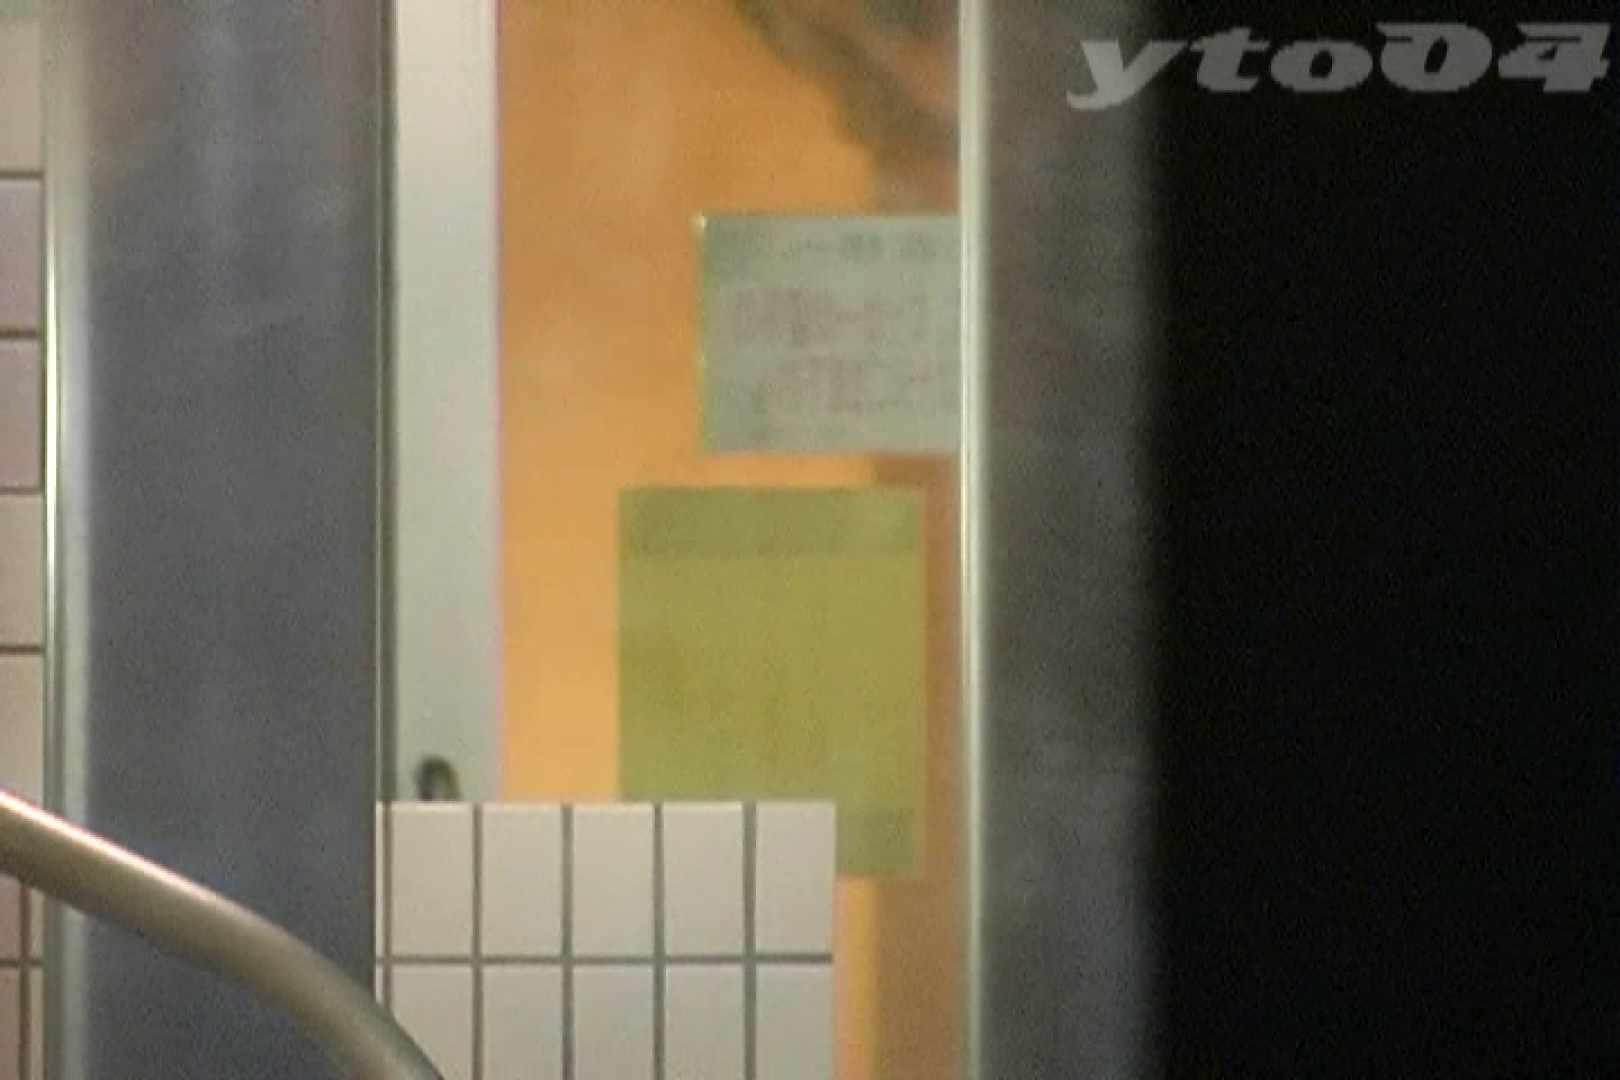 ▲復活限定▲合宿ホテル女風呂盗撮 Vol.24 名作  55pic 37